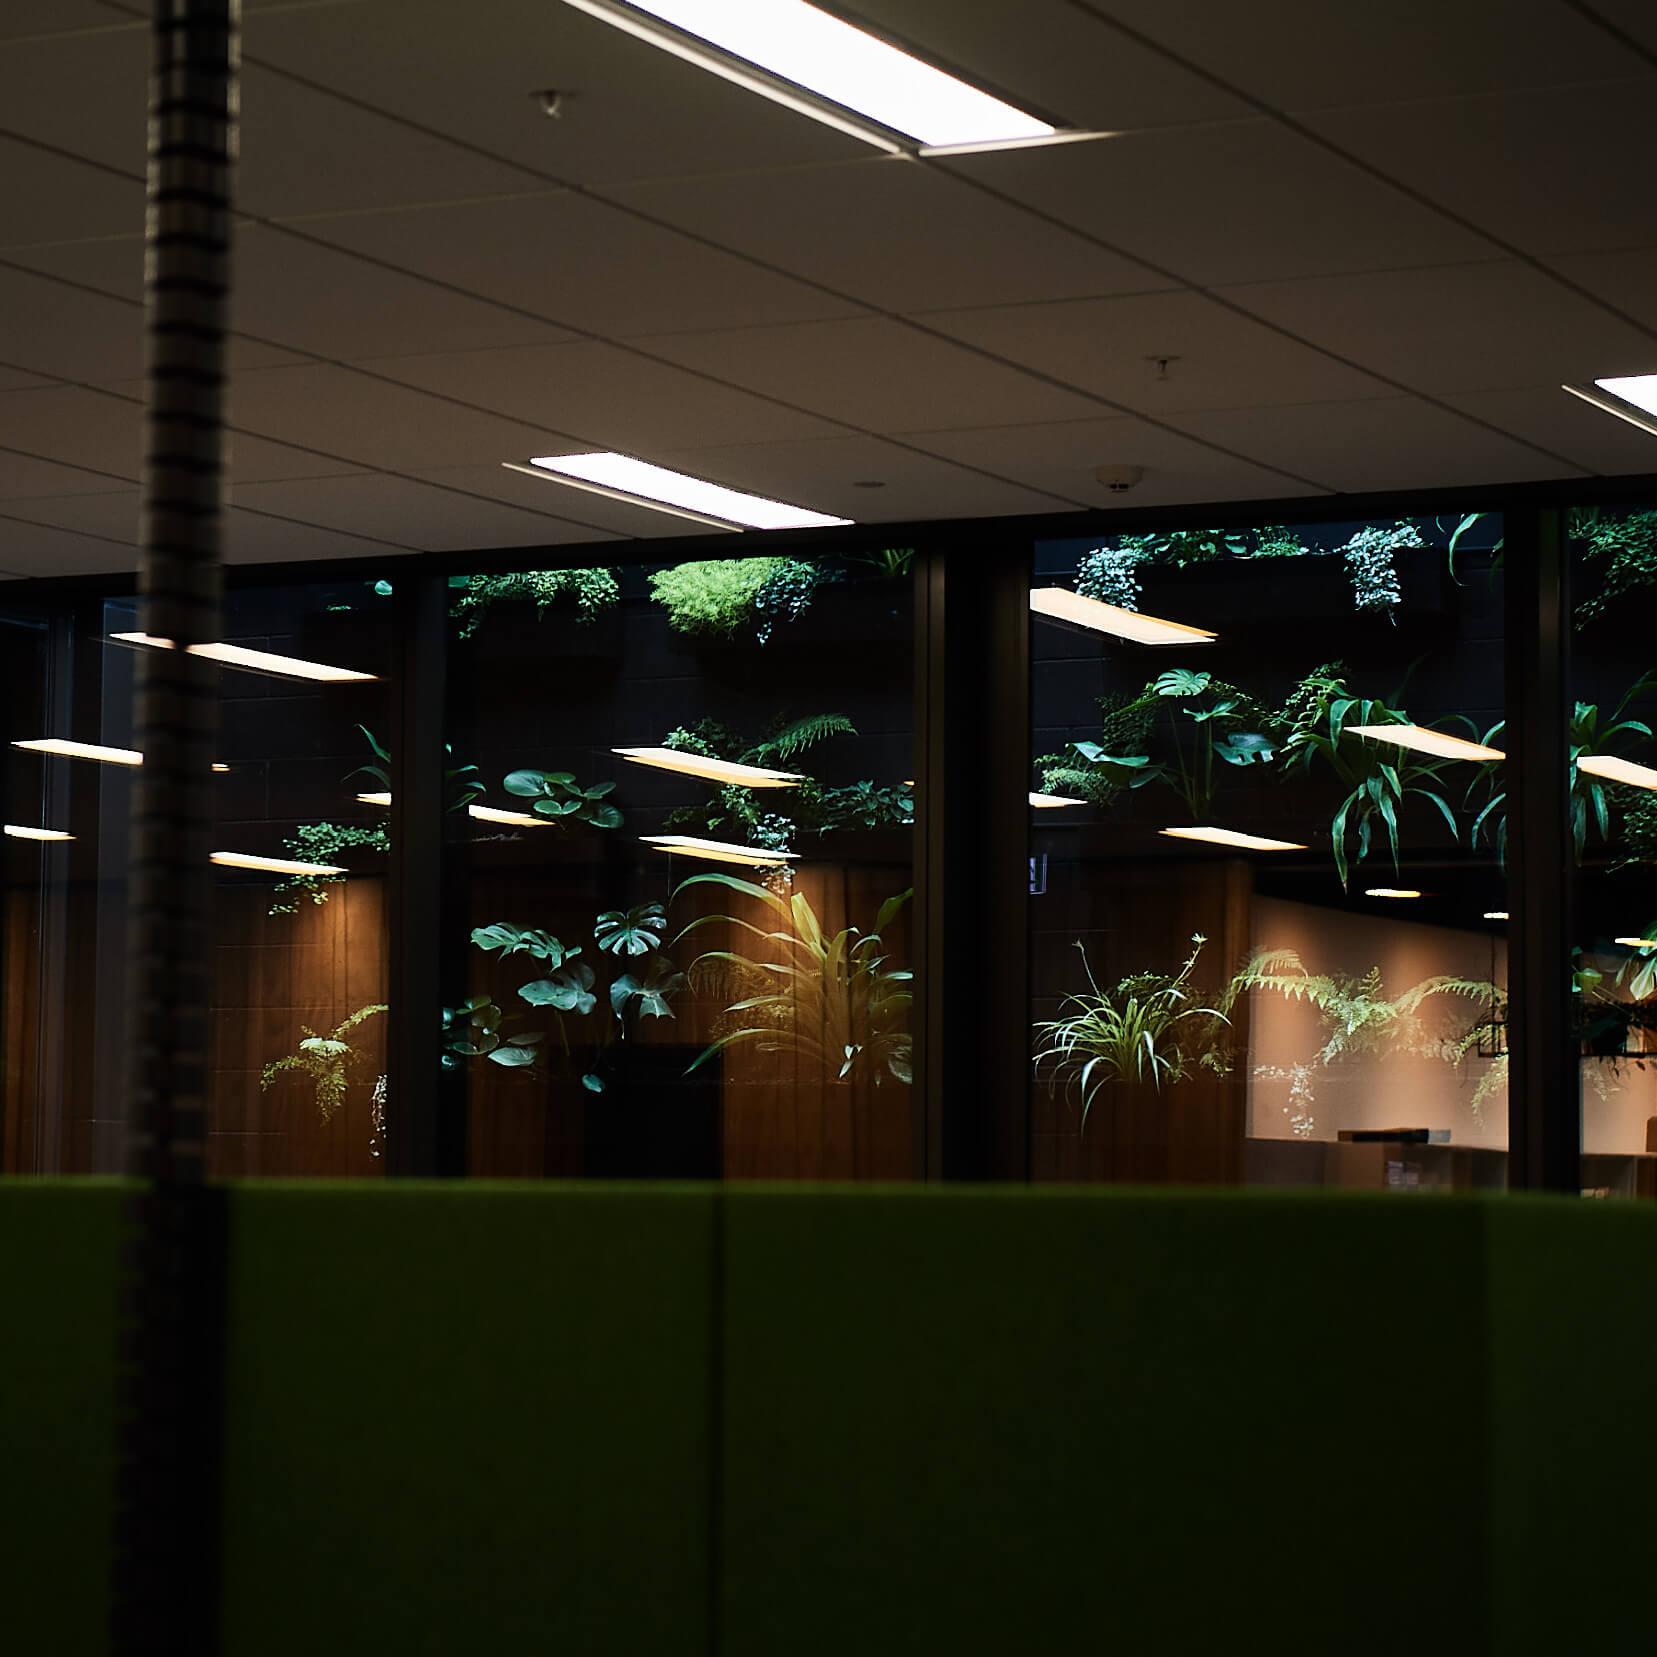 portfolio-offices-spaces-34salest-image3